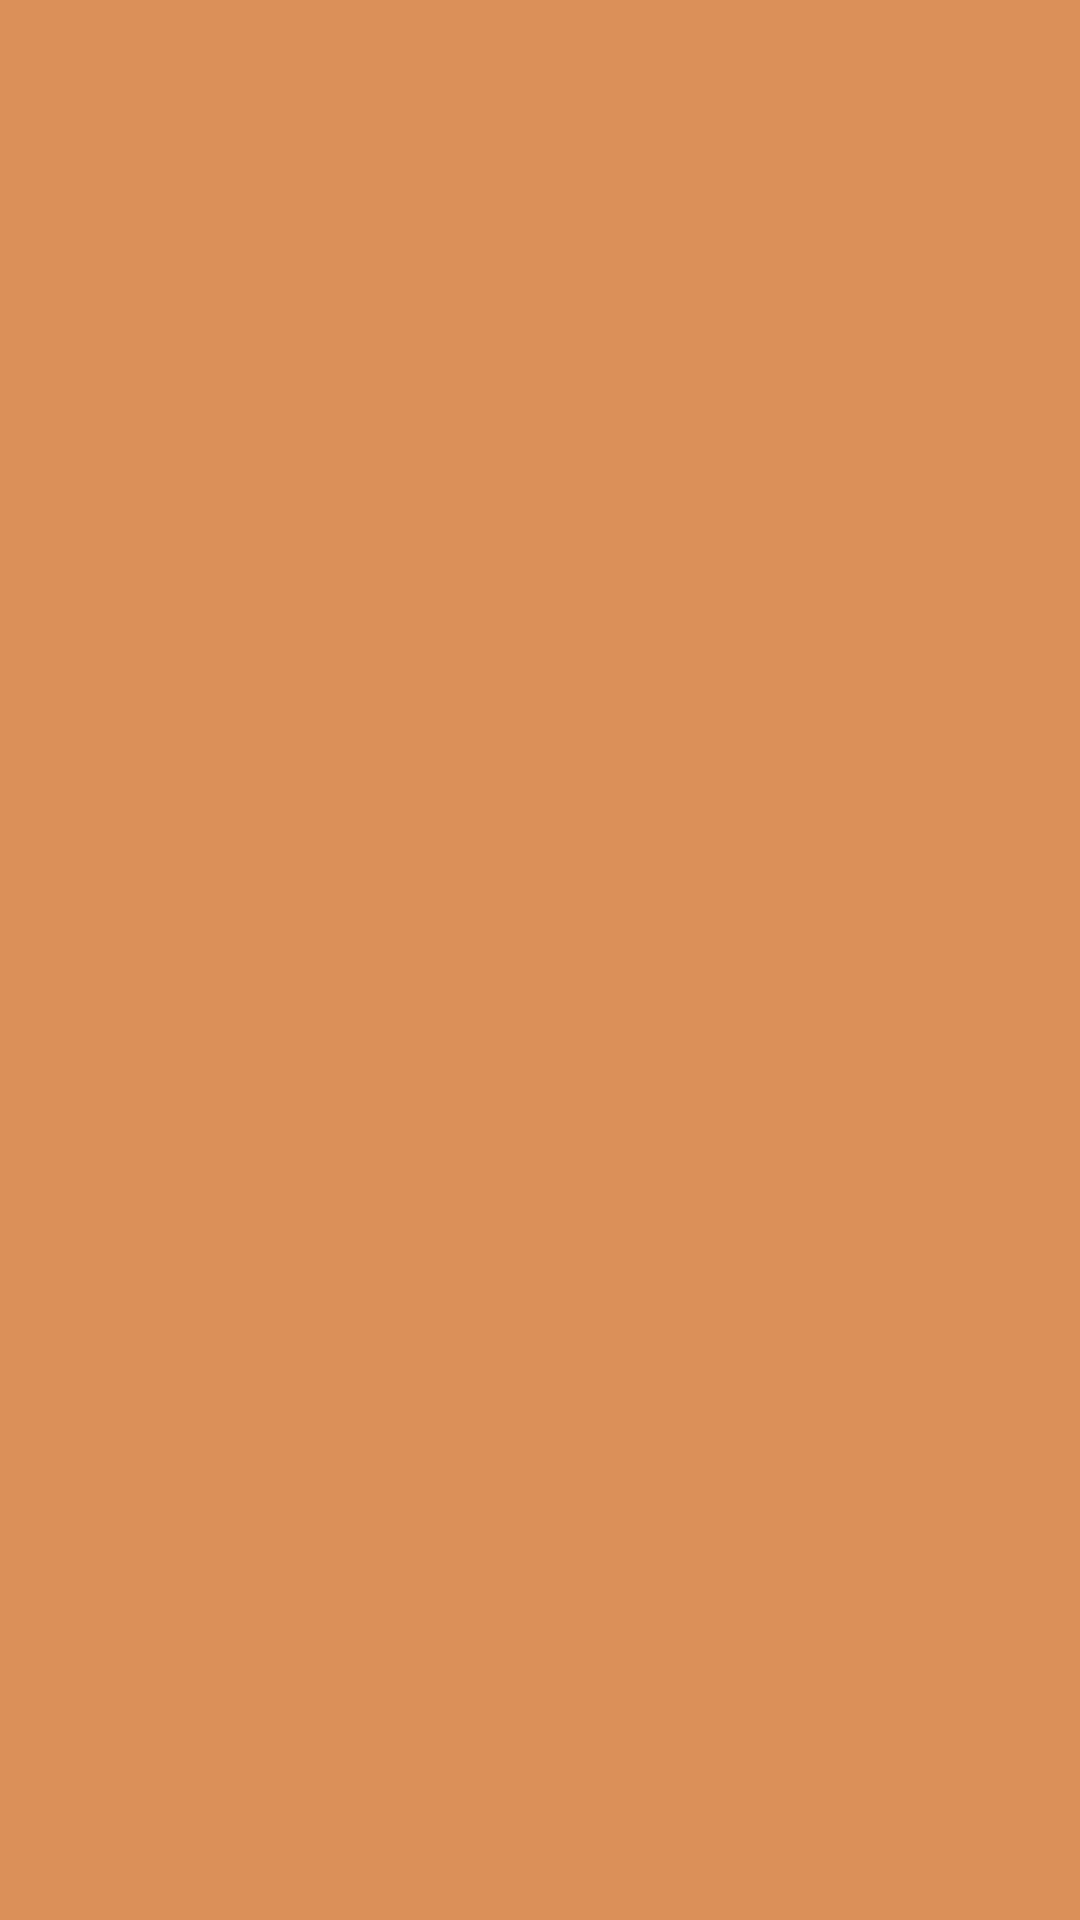 1080x1920 Persian Orange Solid Color Background